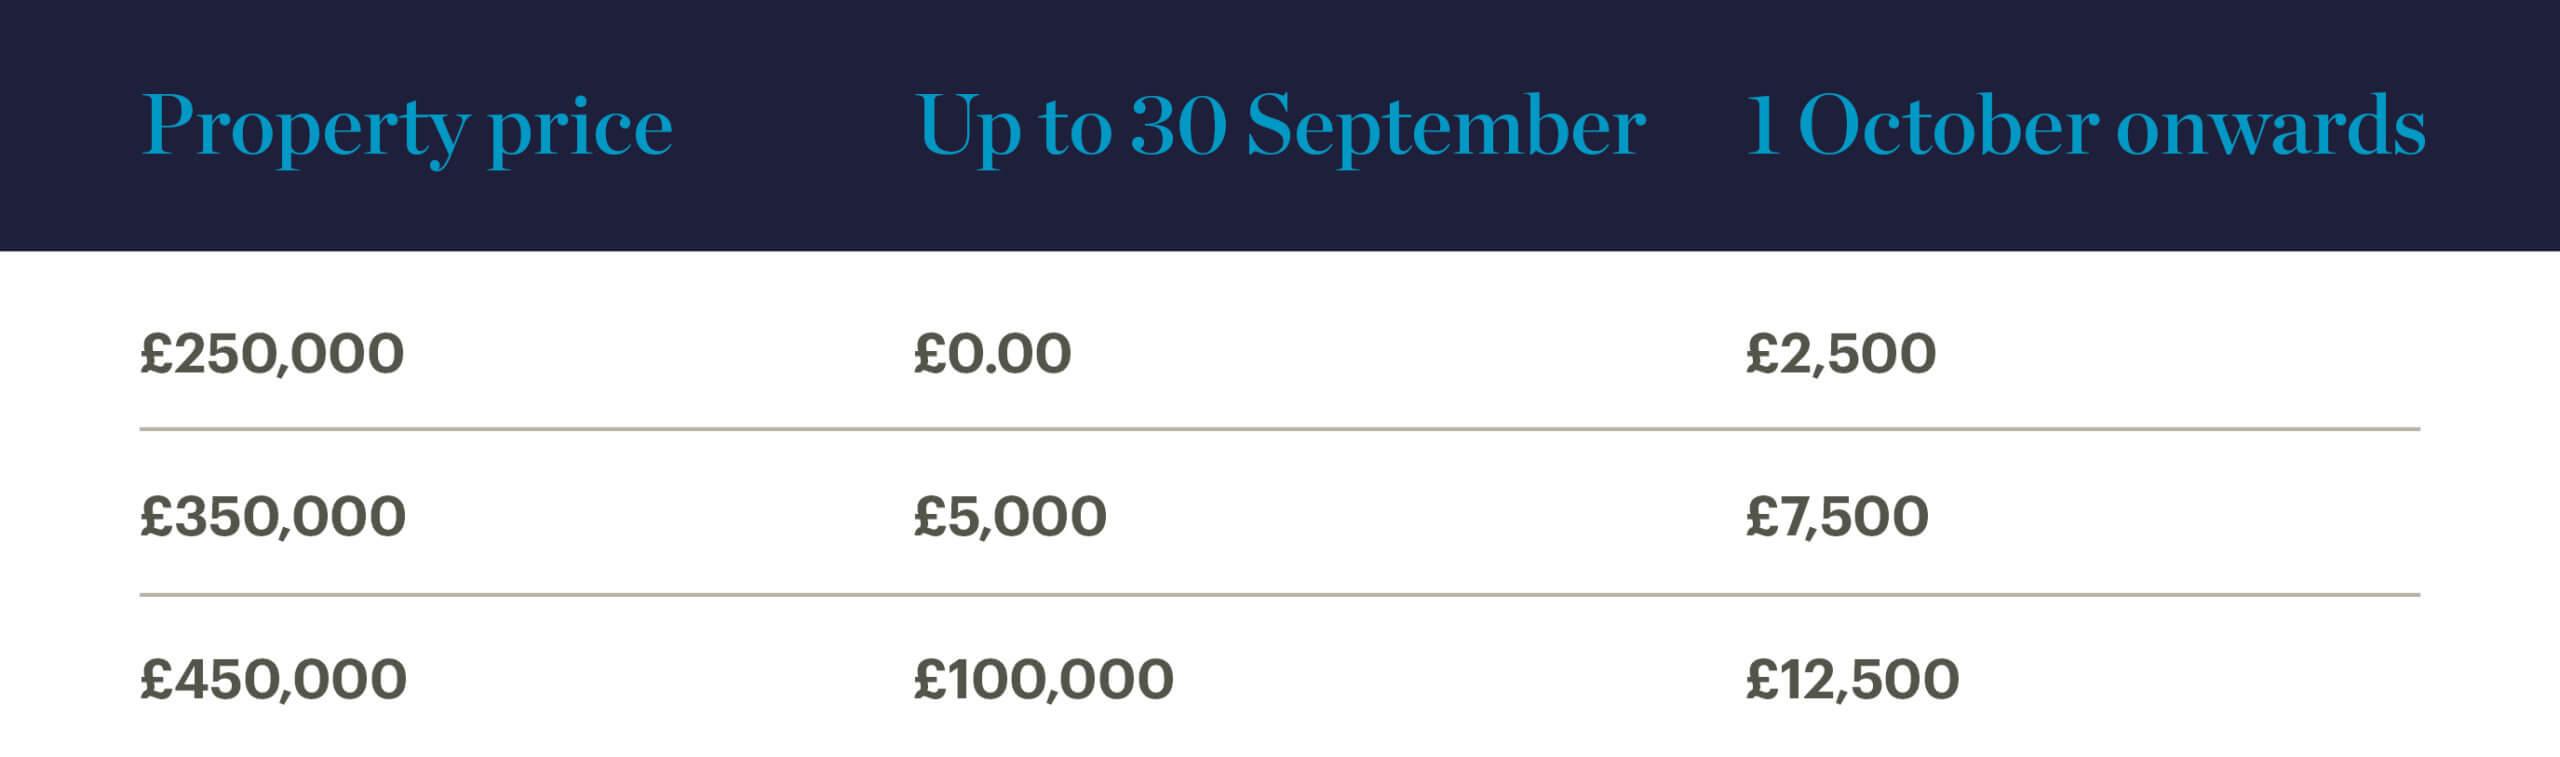 Home purchase savings before 30 September